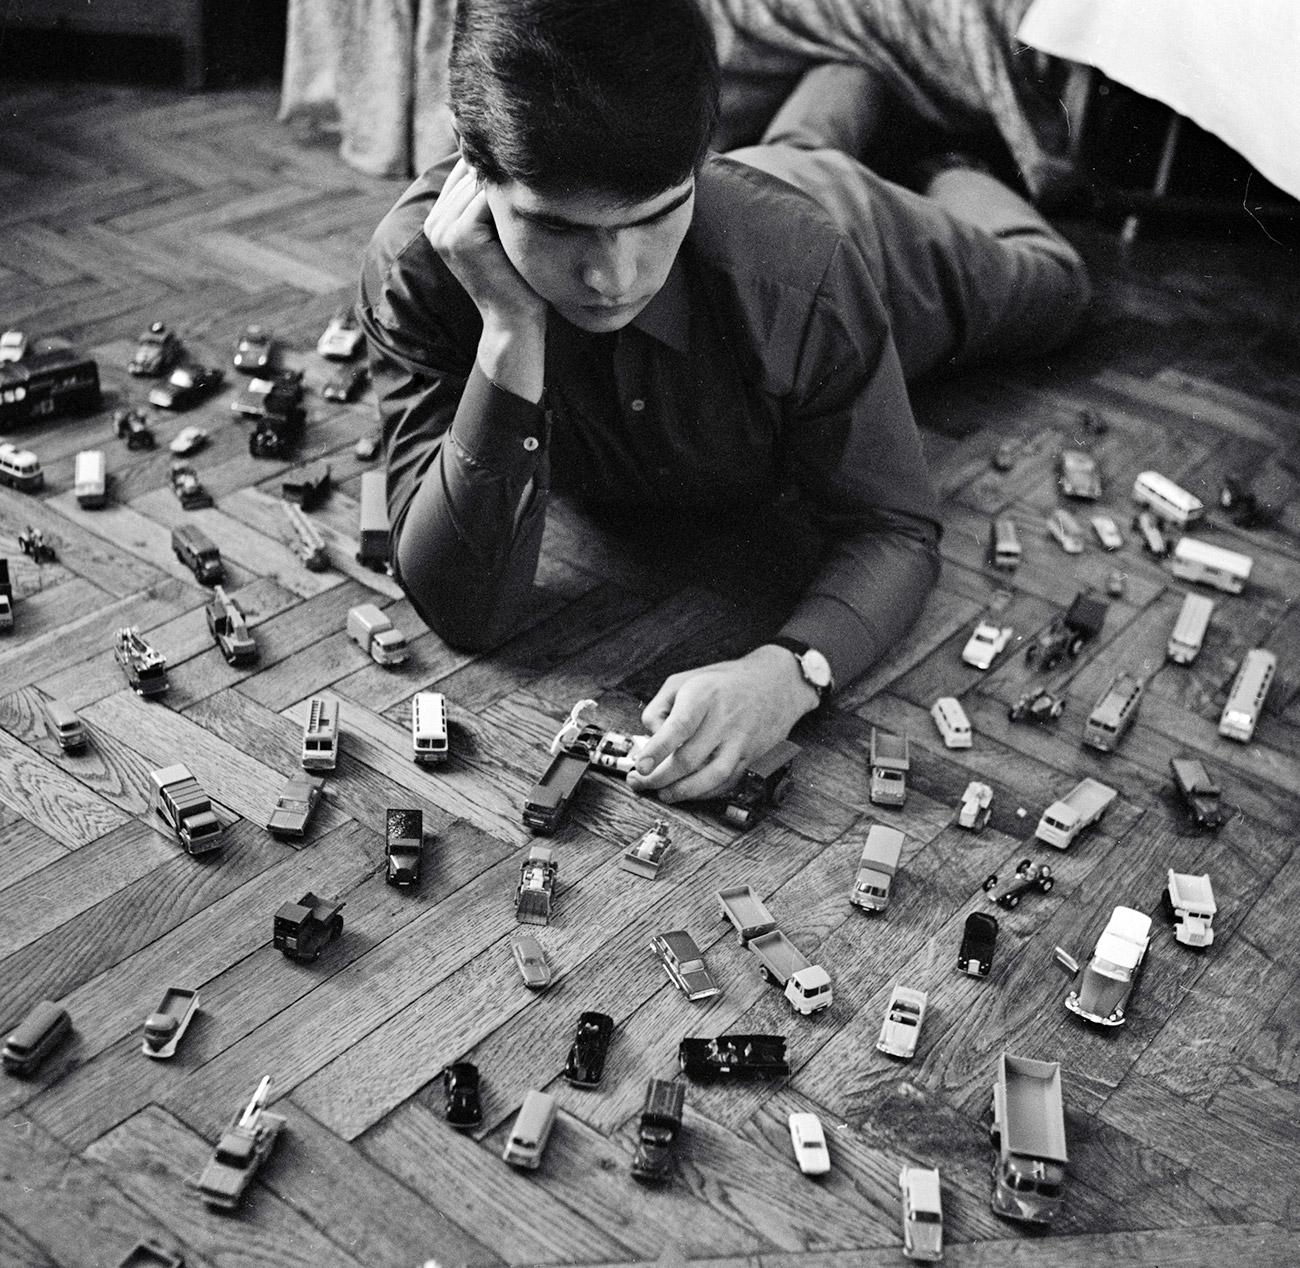 Seorang anak pengoleksi mobil-mobilan, 1968. Sumber: Boris Ushmaykin/RIA Novosti